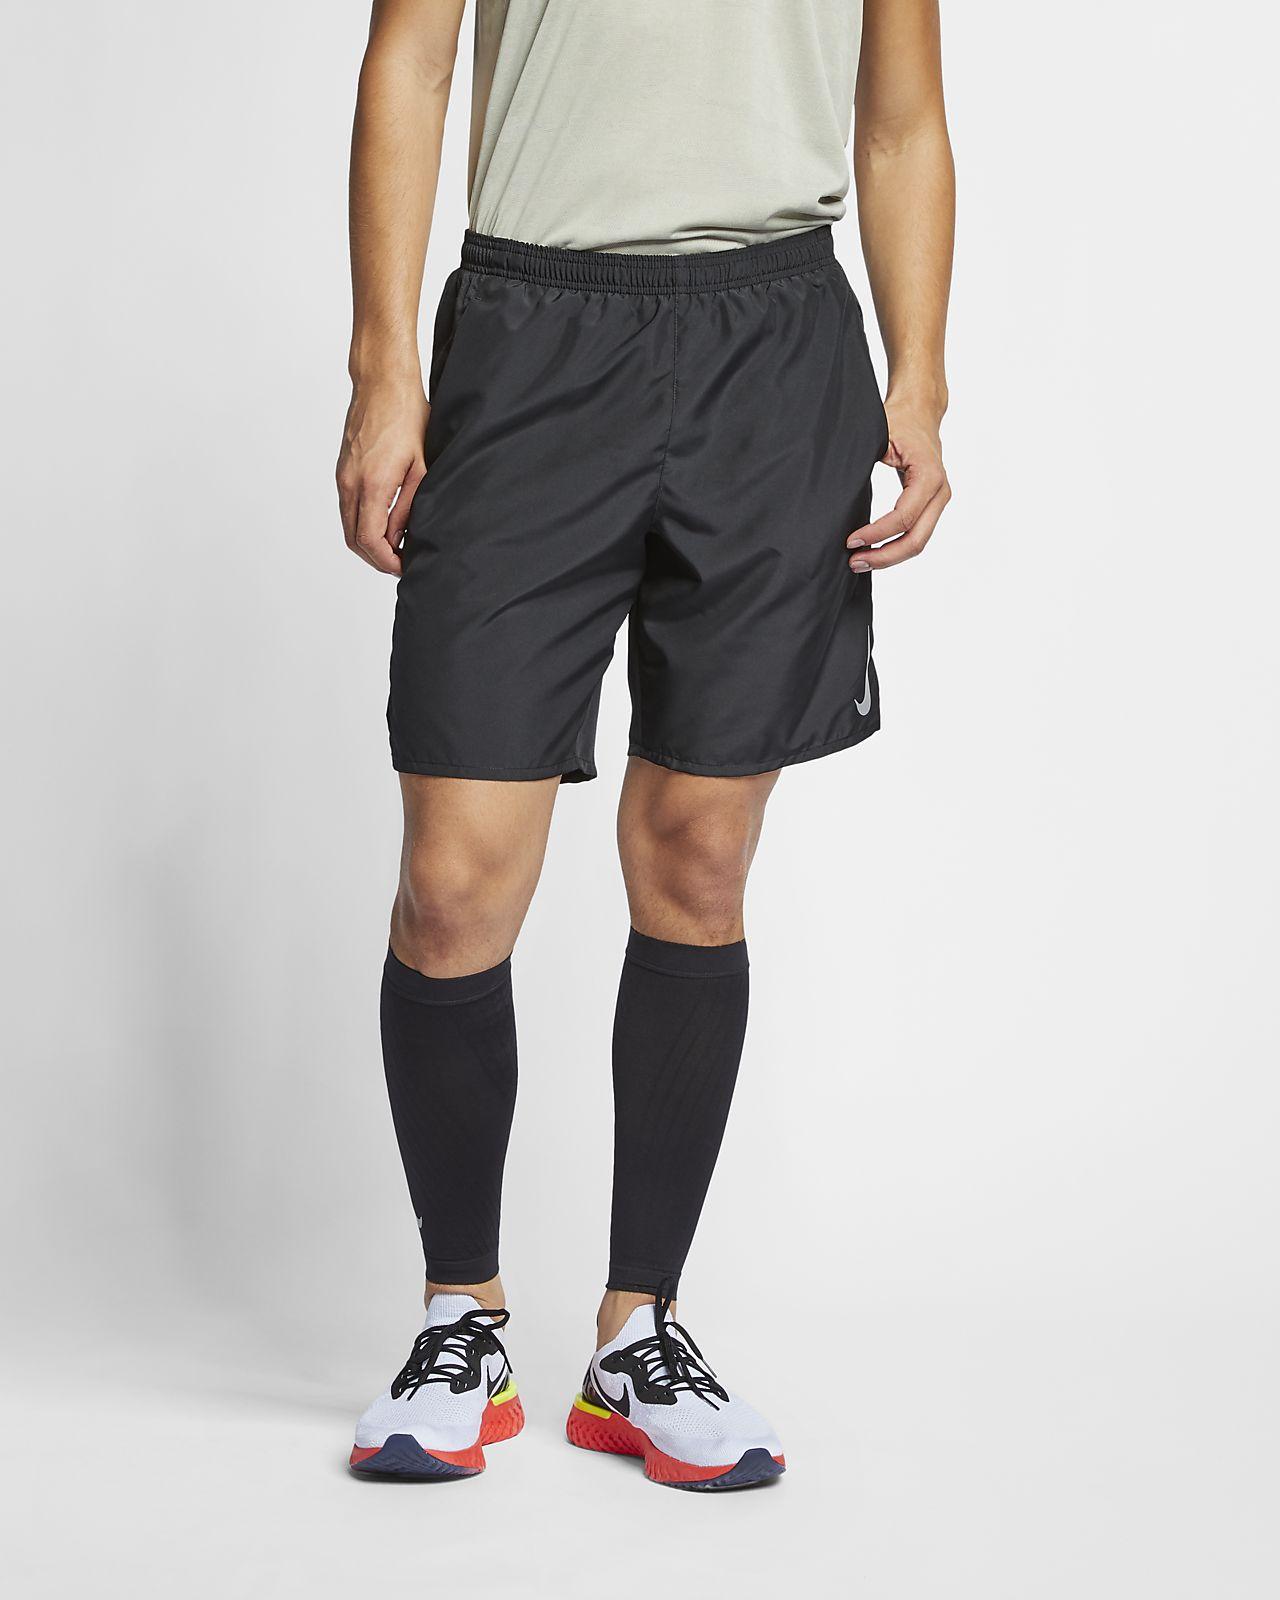 Short de running Nike Challenger pour Homme